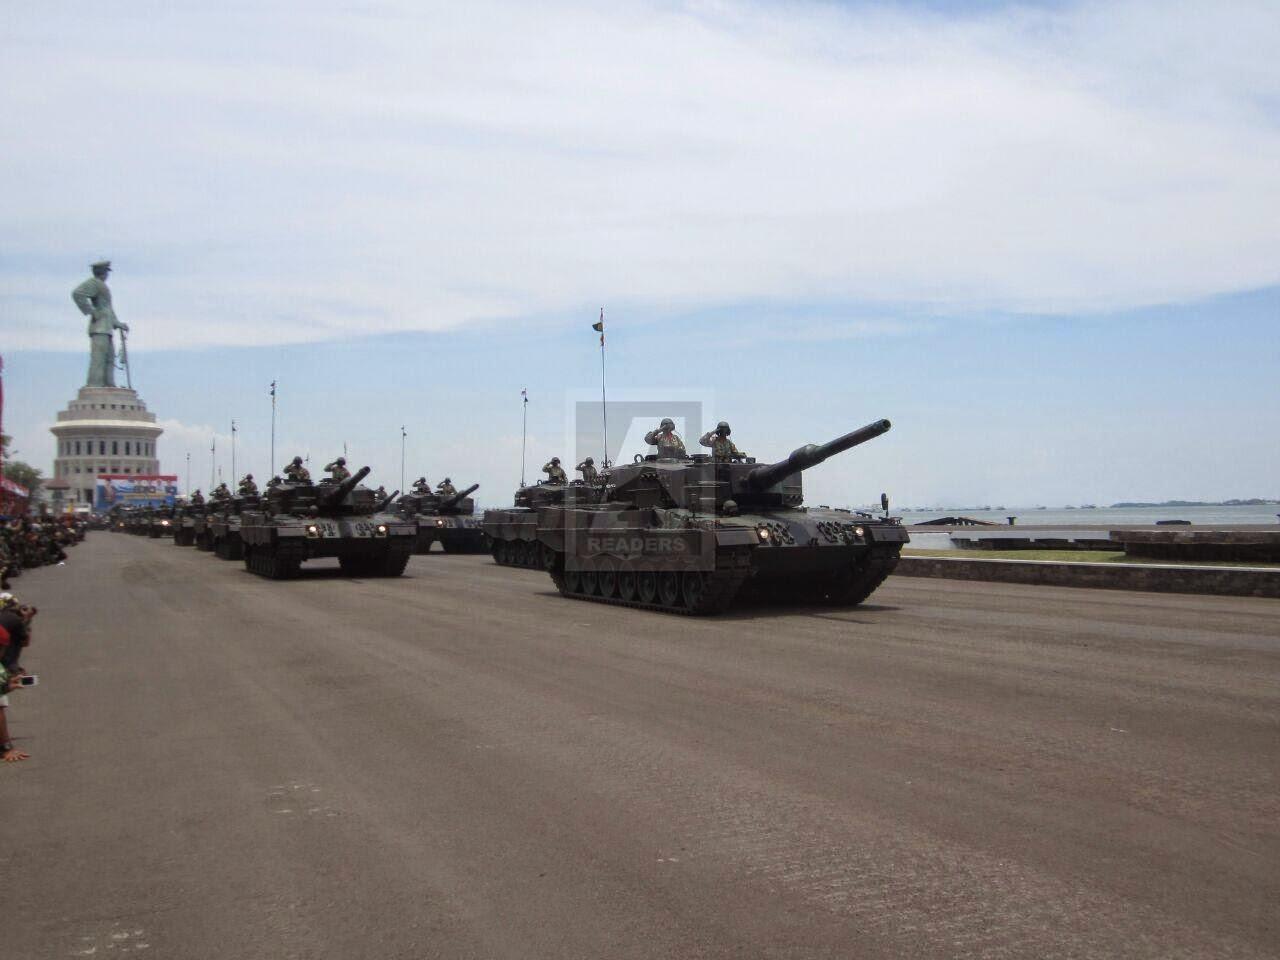 Cara TNI AD Merawat Persenjataan Modern